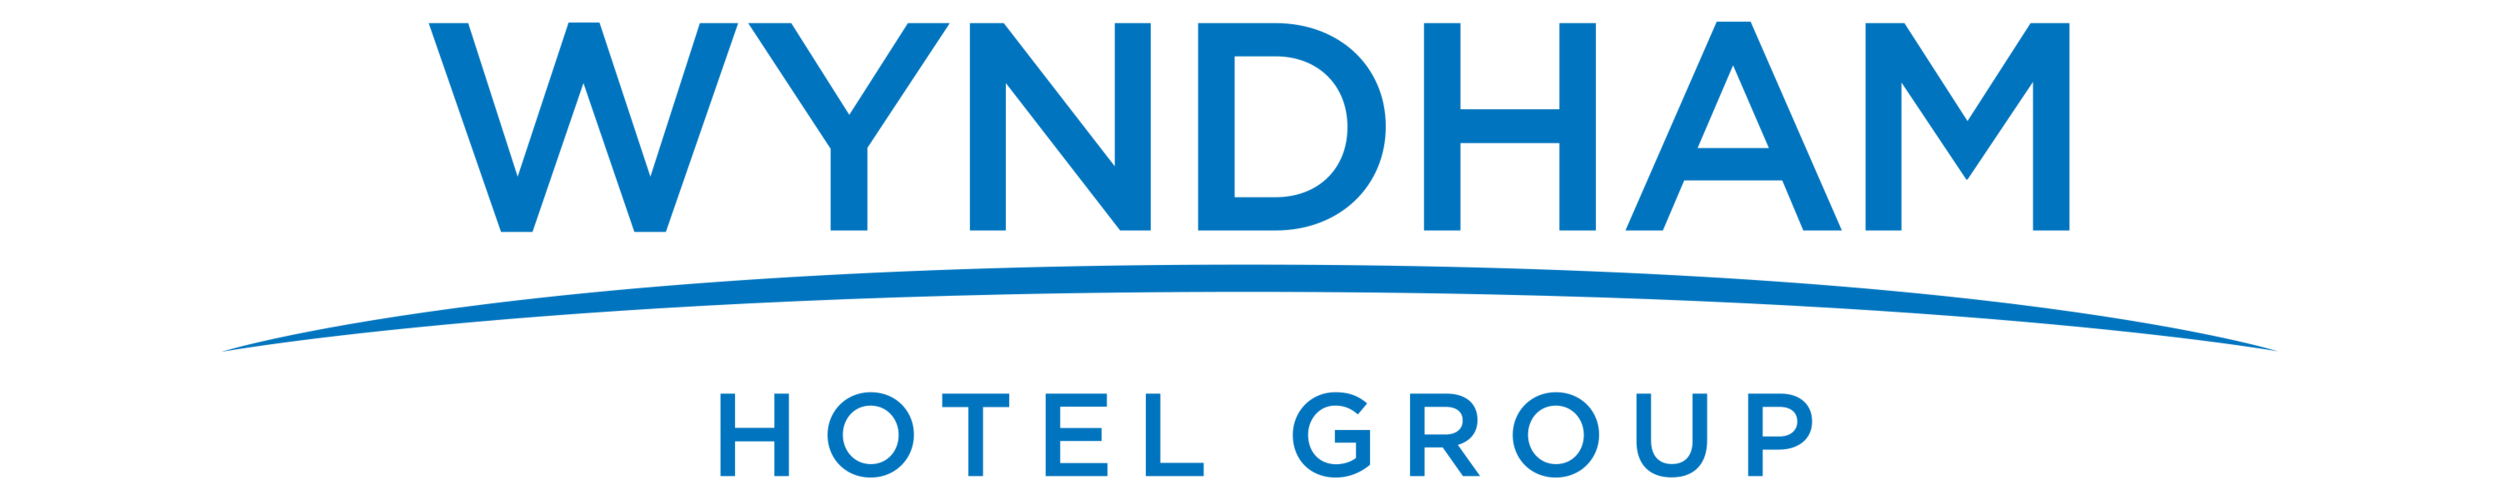 wyndham hotel group.png